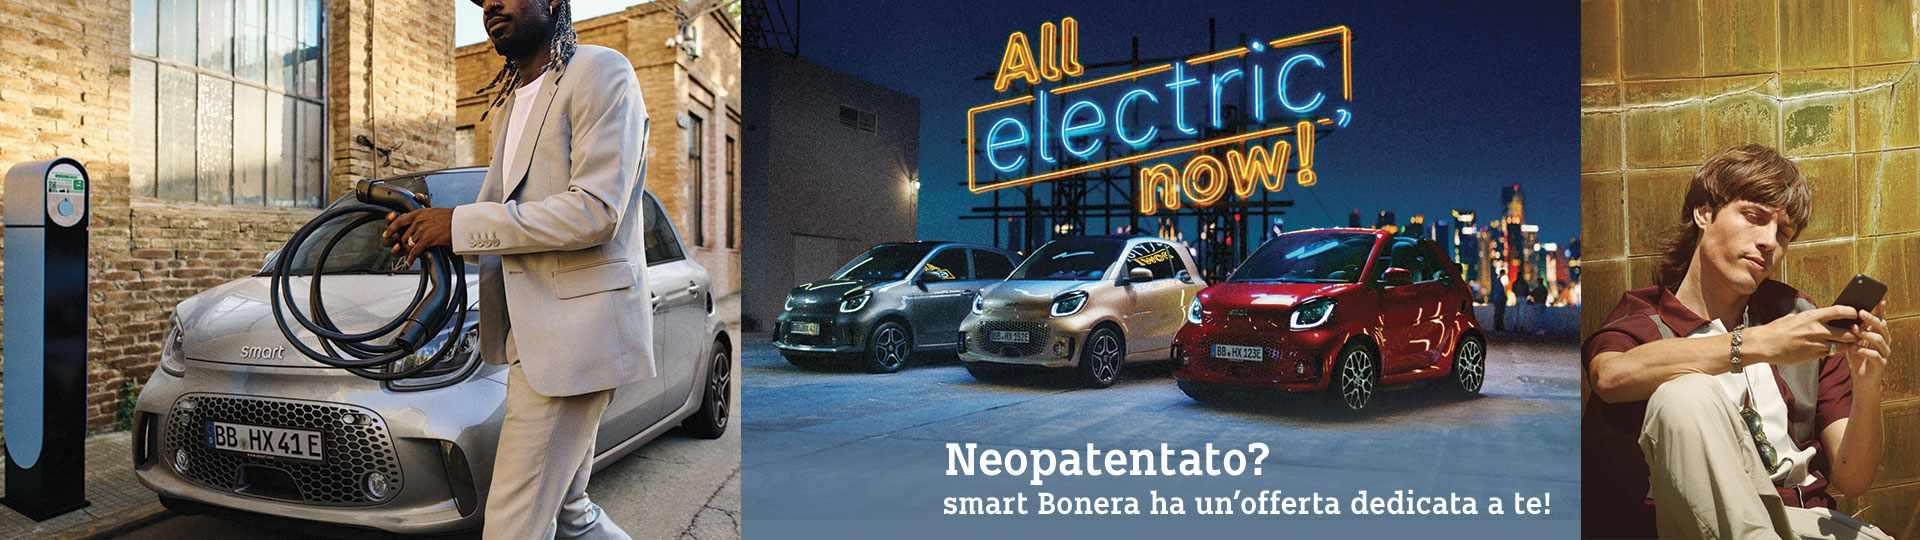 header_smart_neopatentati_marzo_2021.jpg